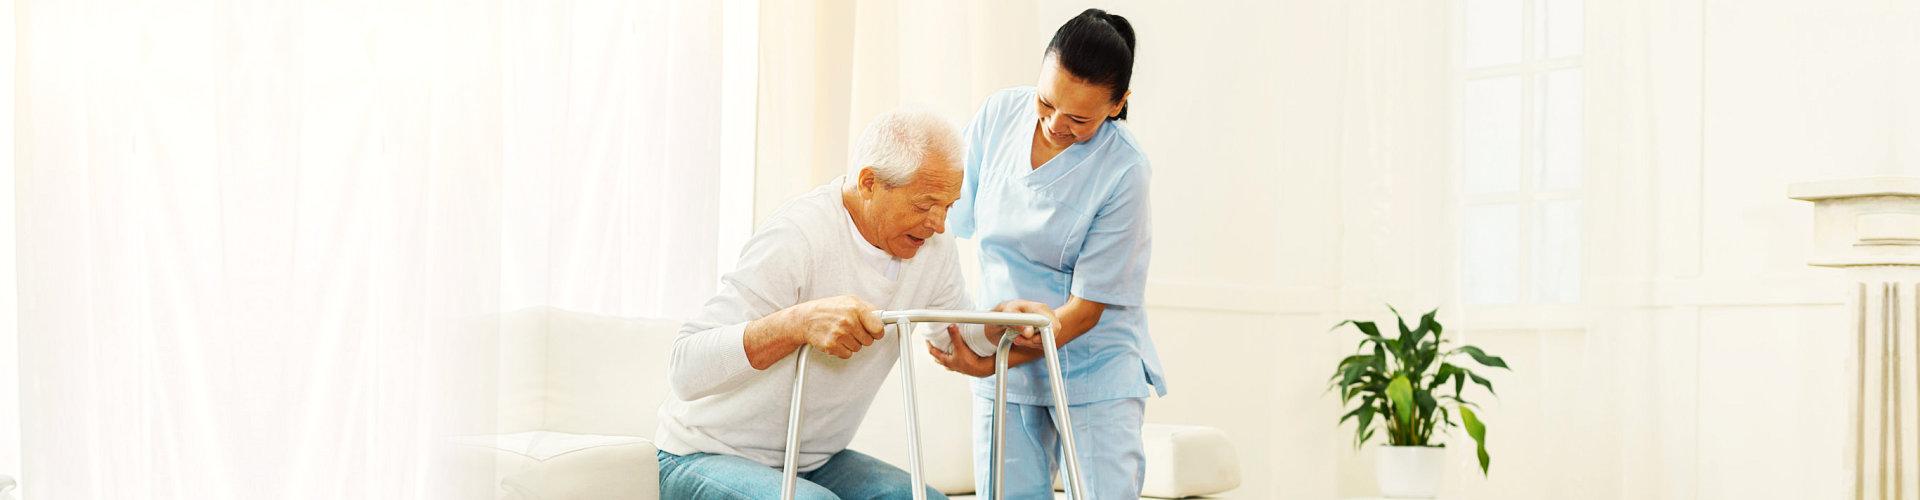 a caregiver assisting a senior man use a walker